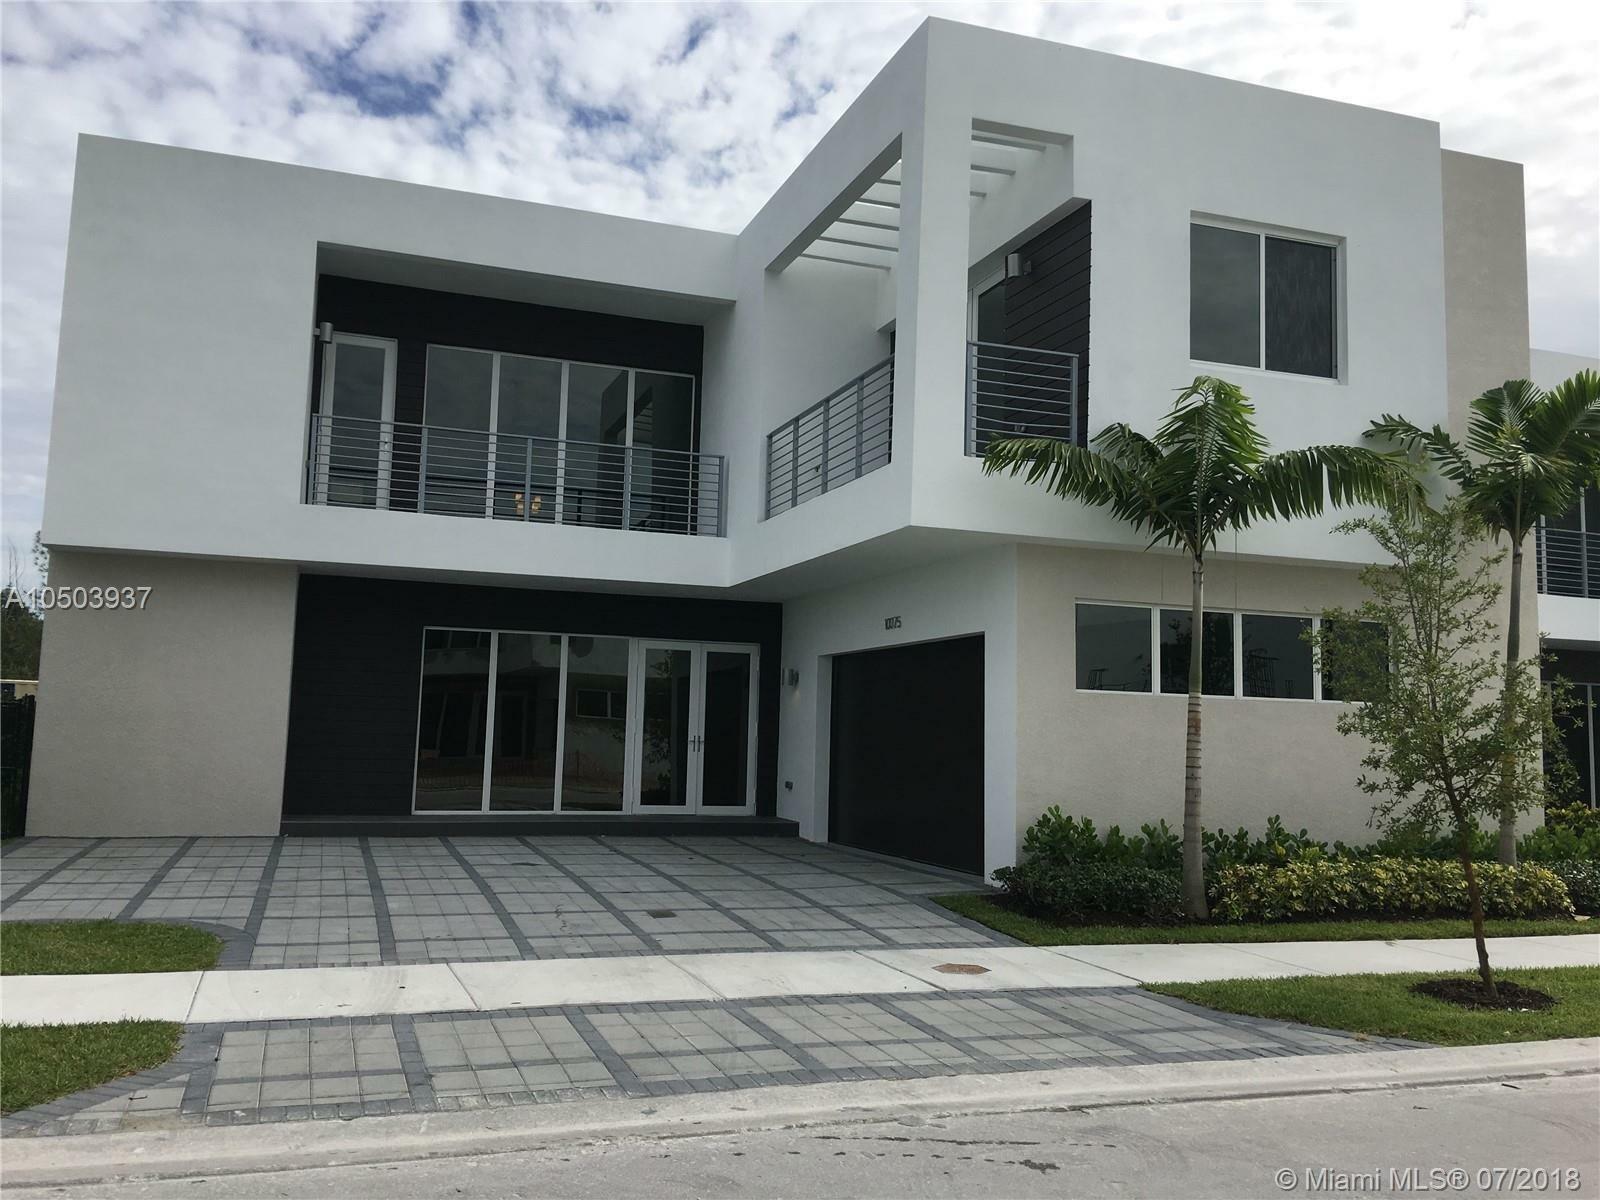 Casa en Doral, Florida, Estados Unidos 1 - 11319738